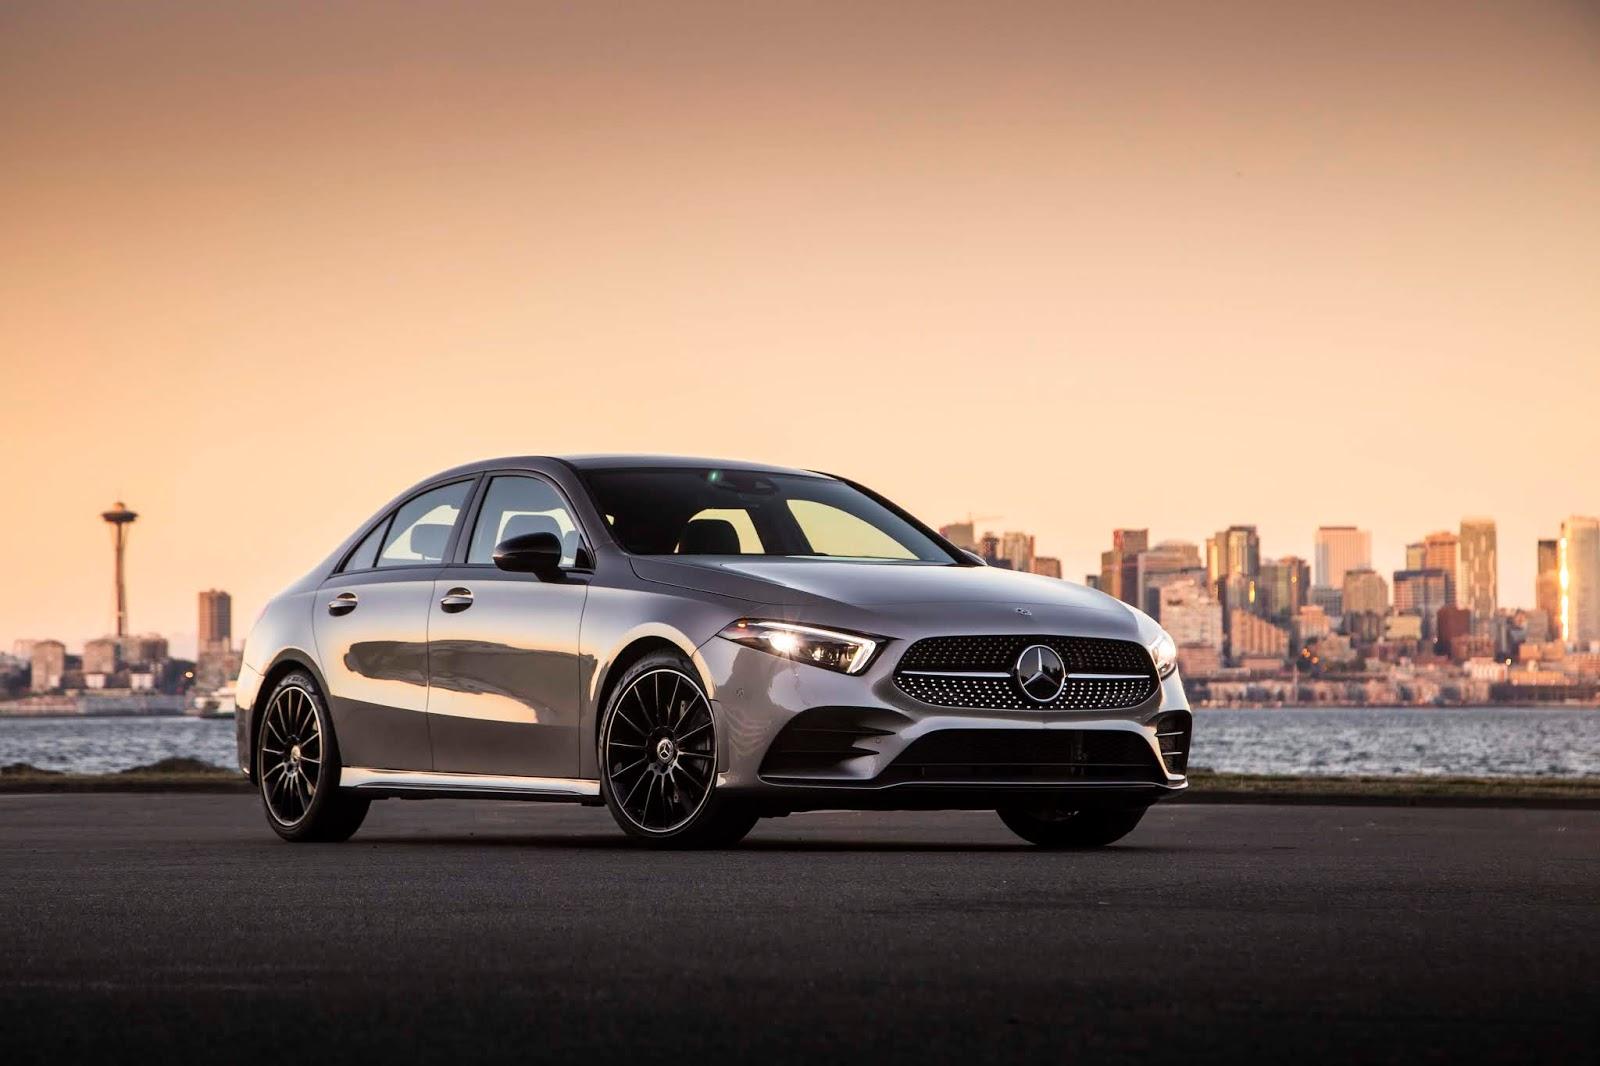 18C0777 002 Από 28.230 ευρώ η τιμή της Mercedes A-Class Sedan Luxury sedan, Mercedes, Mercedes AMG, premium sedan, sedan, zblog, καινούργιο, καινούρια, τιμες